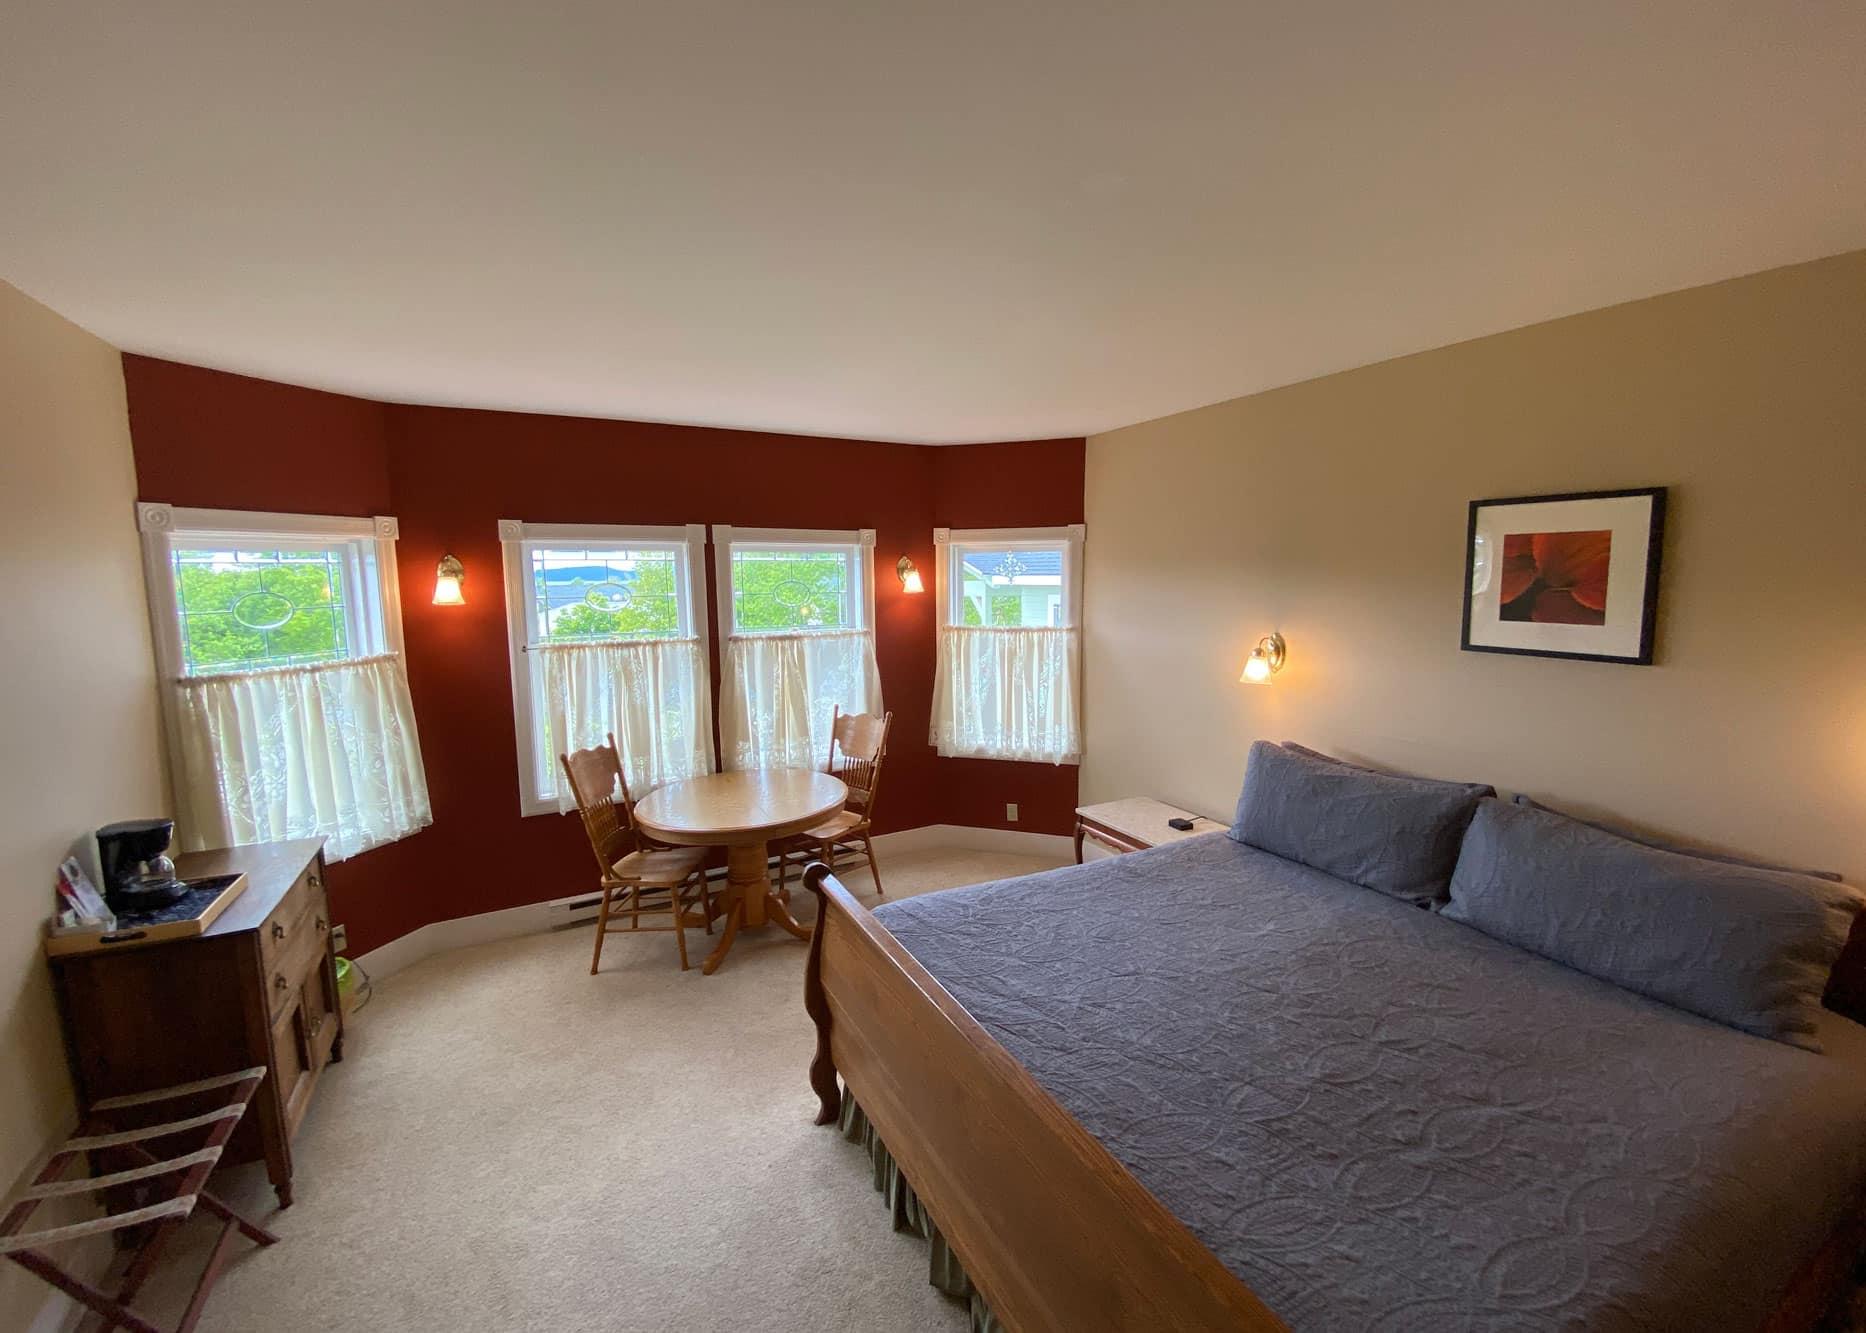 the-edenwild-inn-lopez-island-lodging-2020-room-05-03